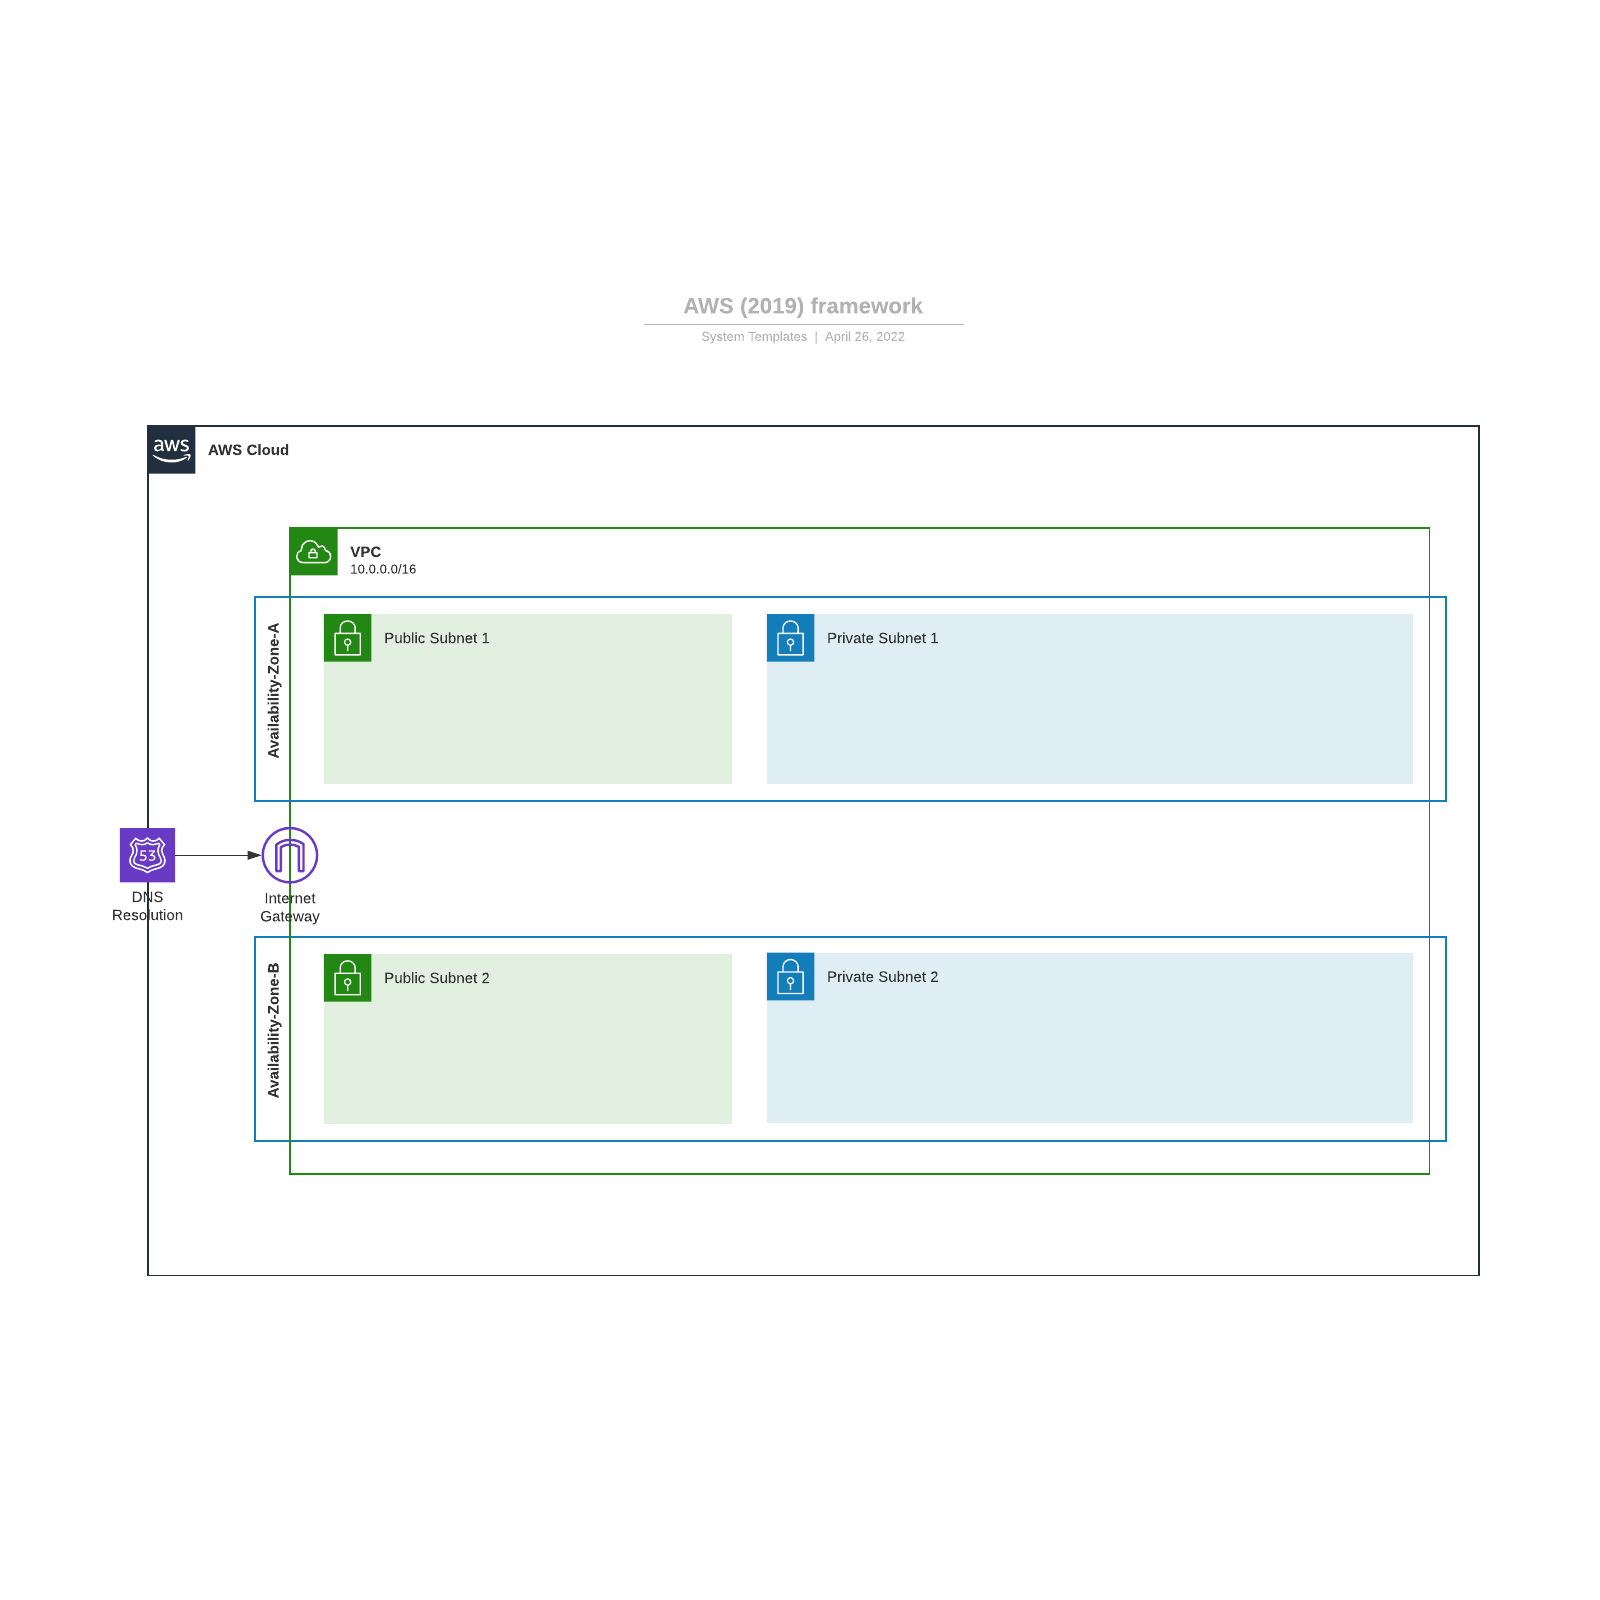 AWS (2019) framework